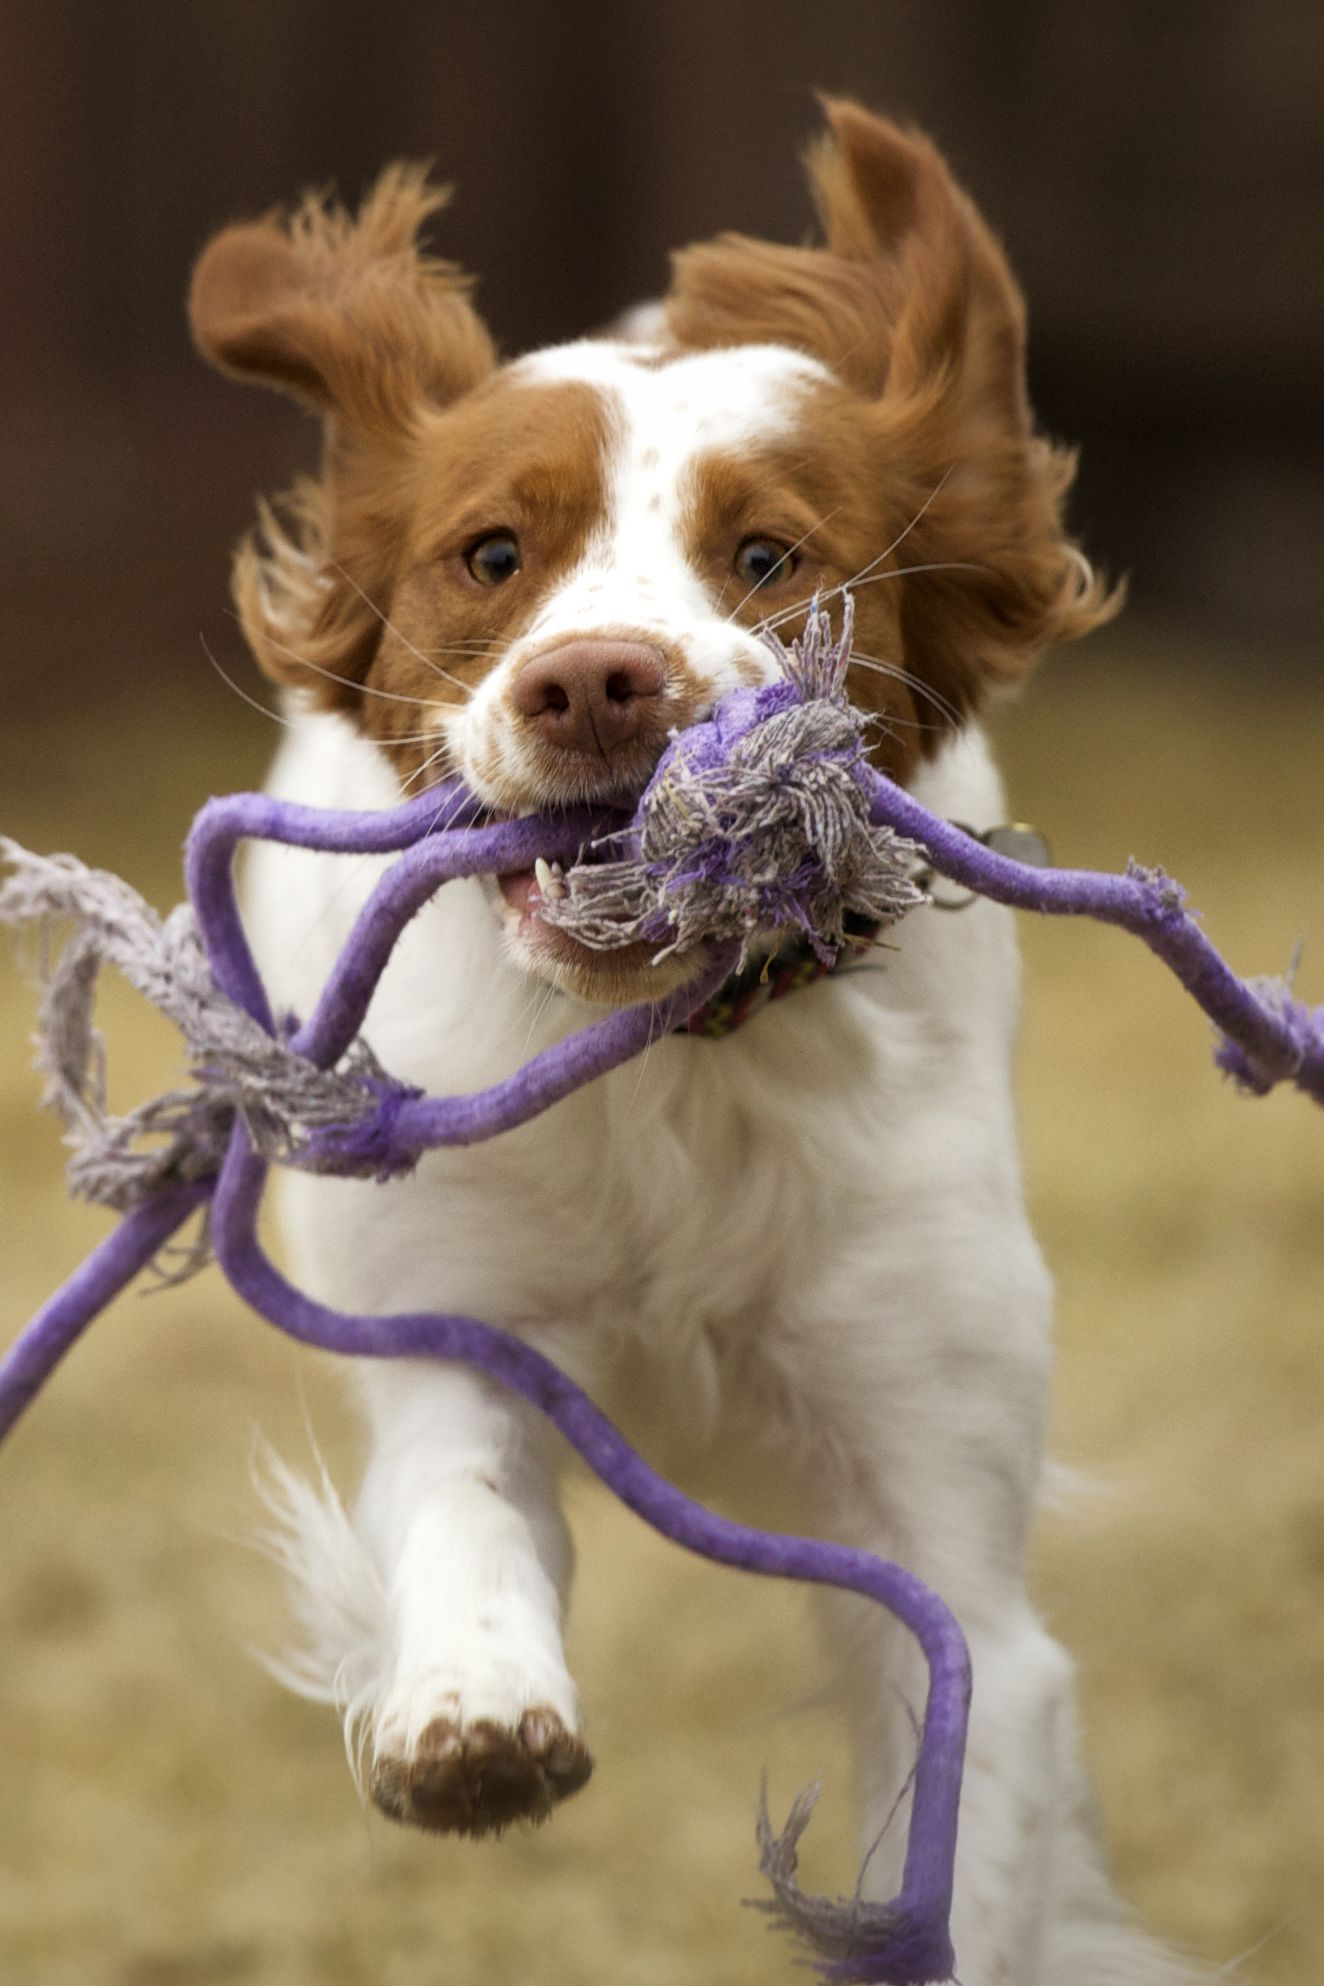 40 Best Medium Sized Dog Breeds - List of Popular Cute Medium Sized ...